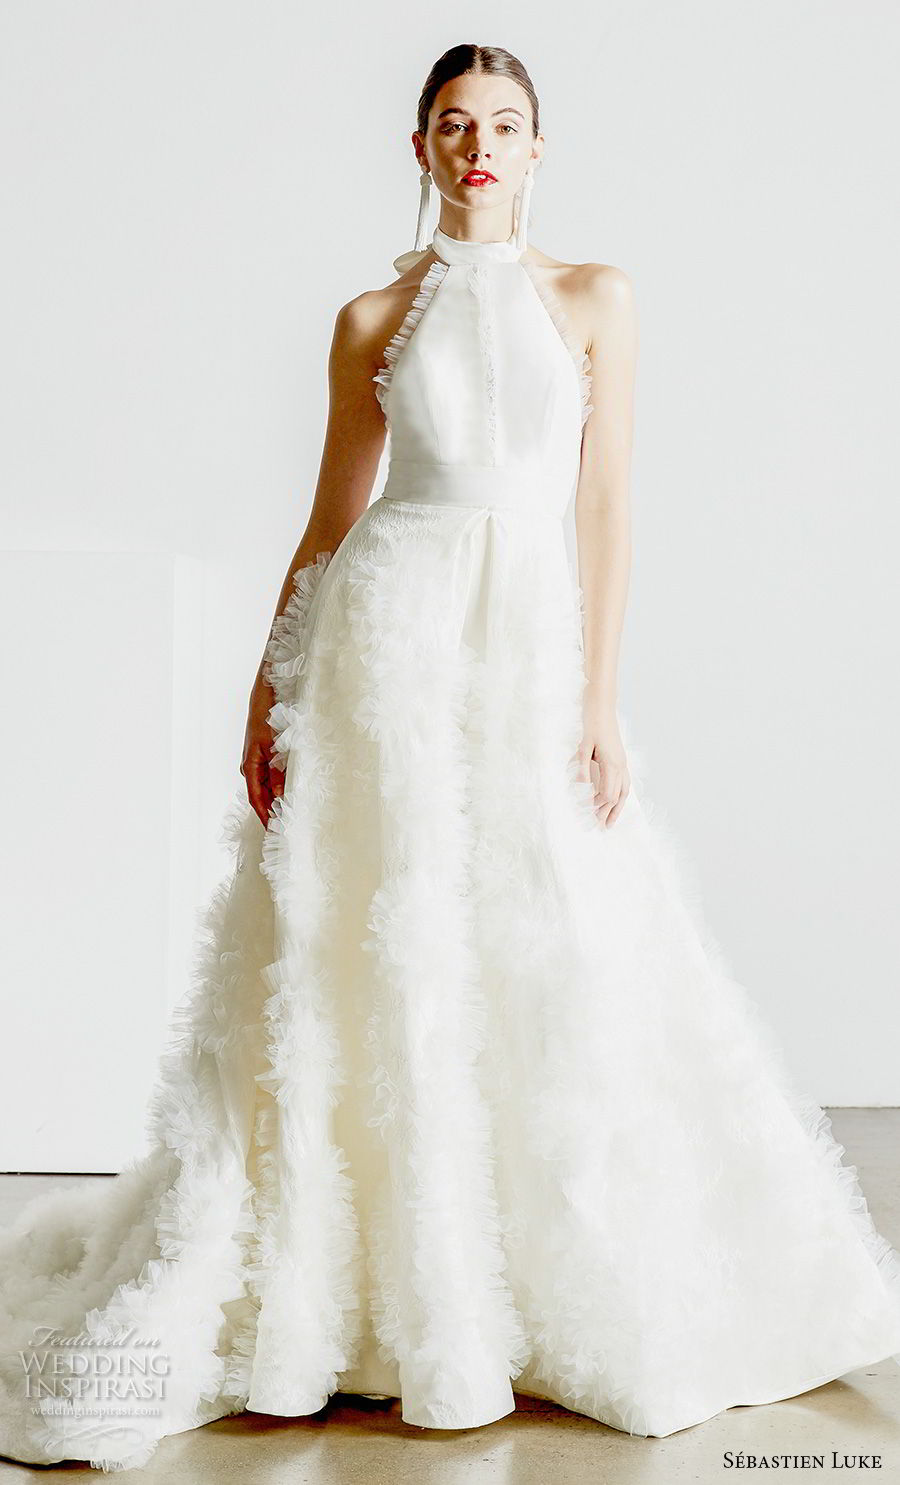 sebastien luke spring 2019 bridal halter high neck simple minimalist modern ankle jumpsuit wedding dress a line overskirt open back chapel train (4) mv